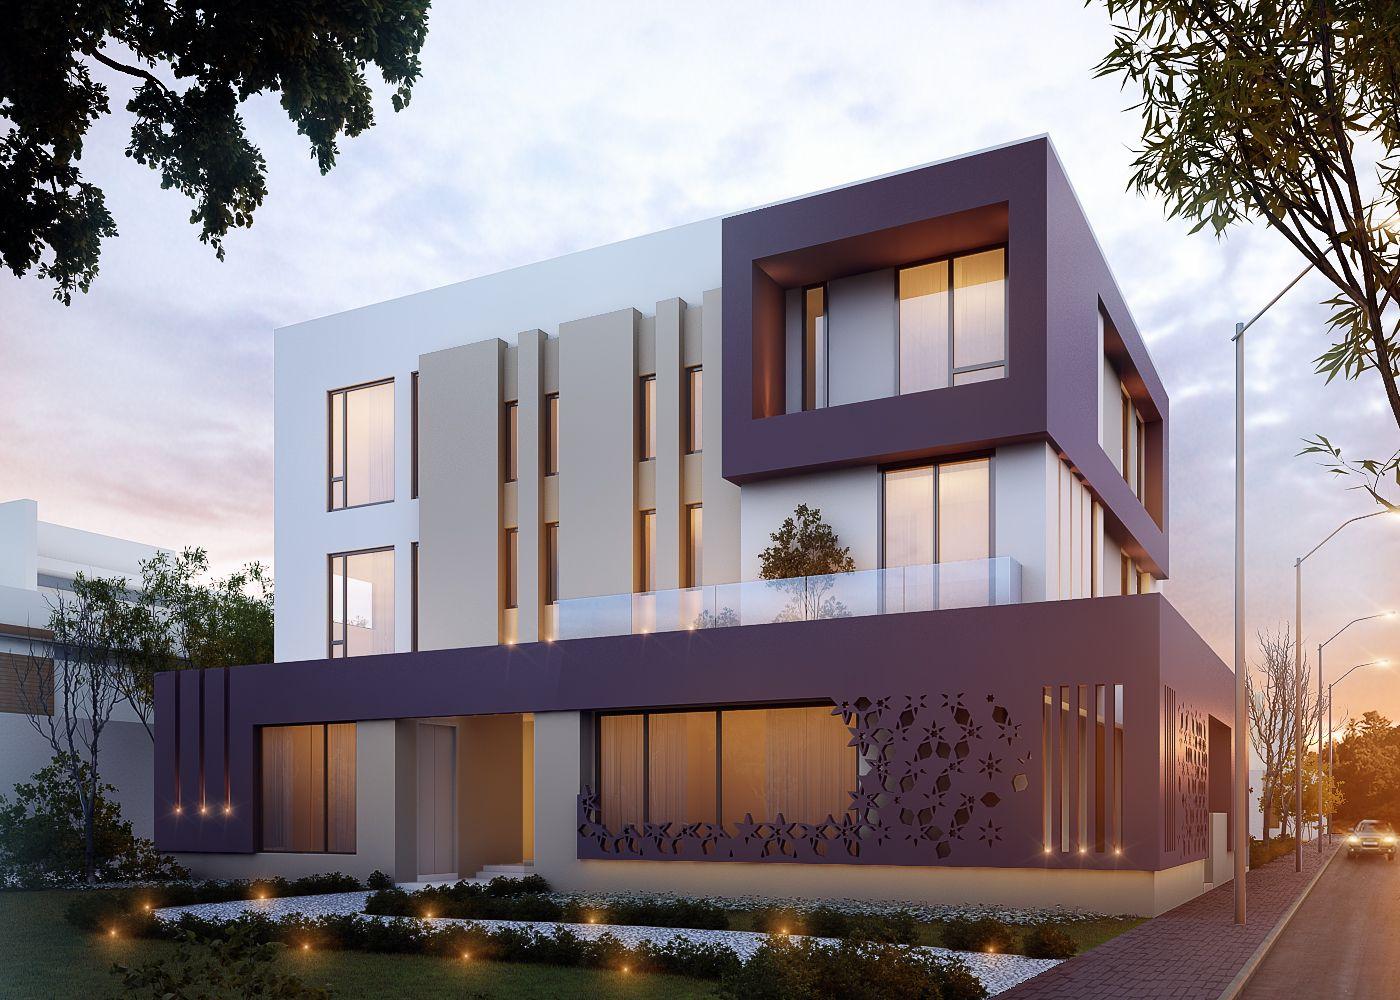 Private Villa Kuwait Sarah Sadeq Architectes In